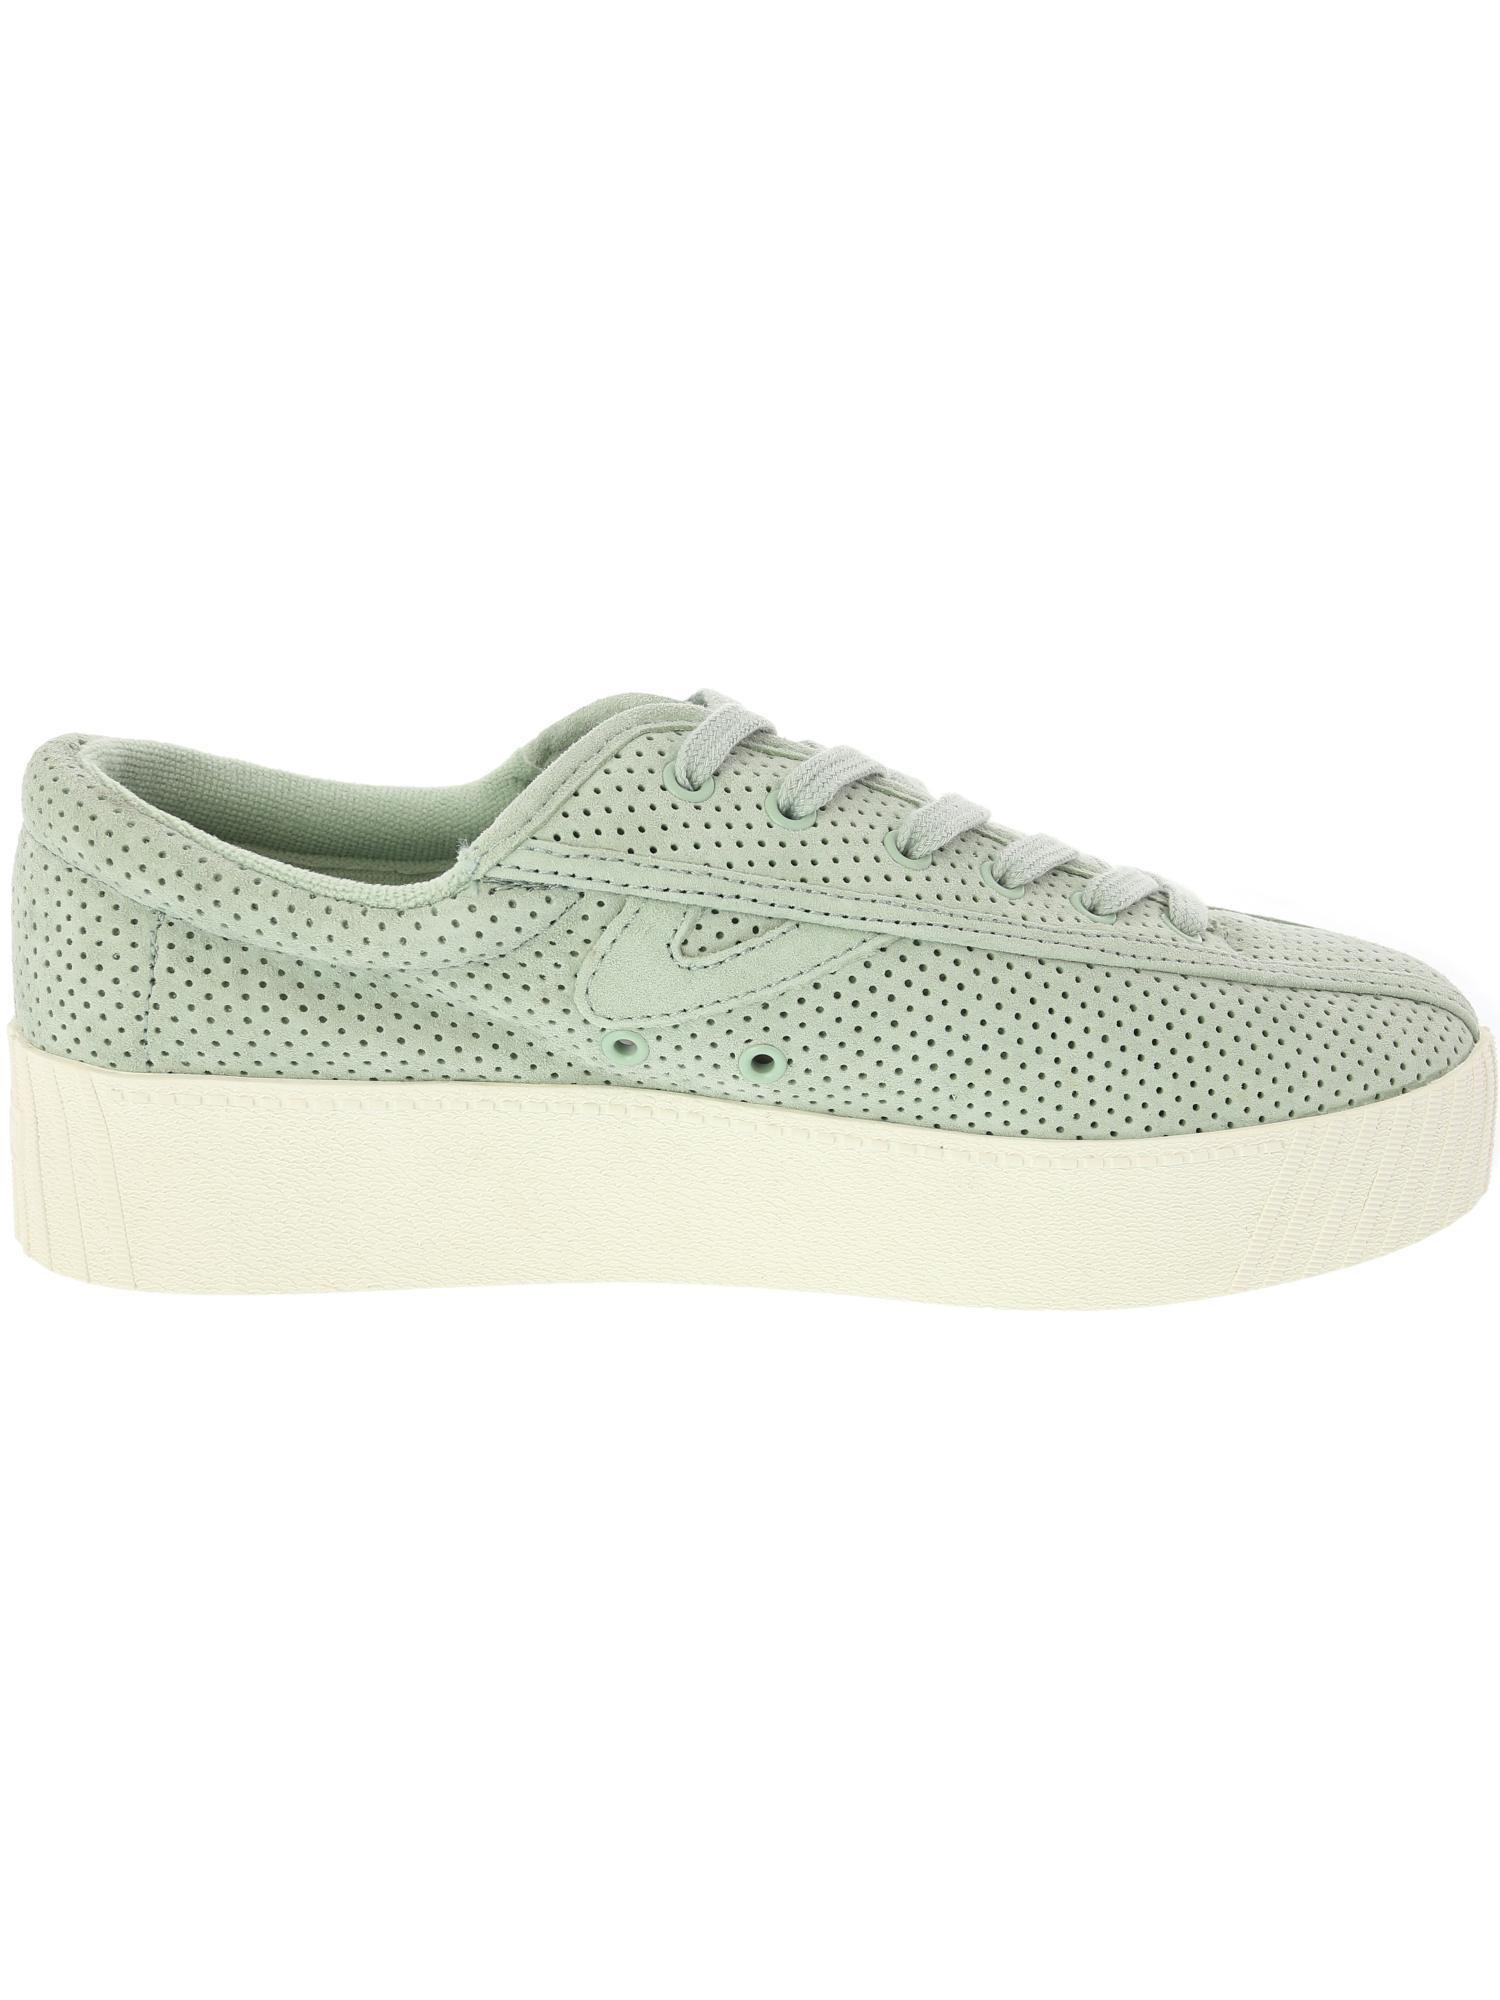 Tretorn-Nylite-3-Bold-Suede-Fashion-Sneaker thumbnail 2